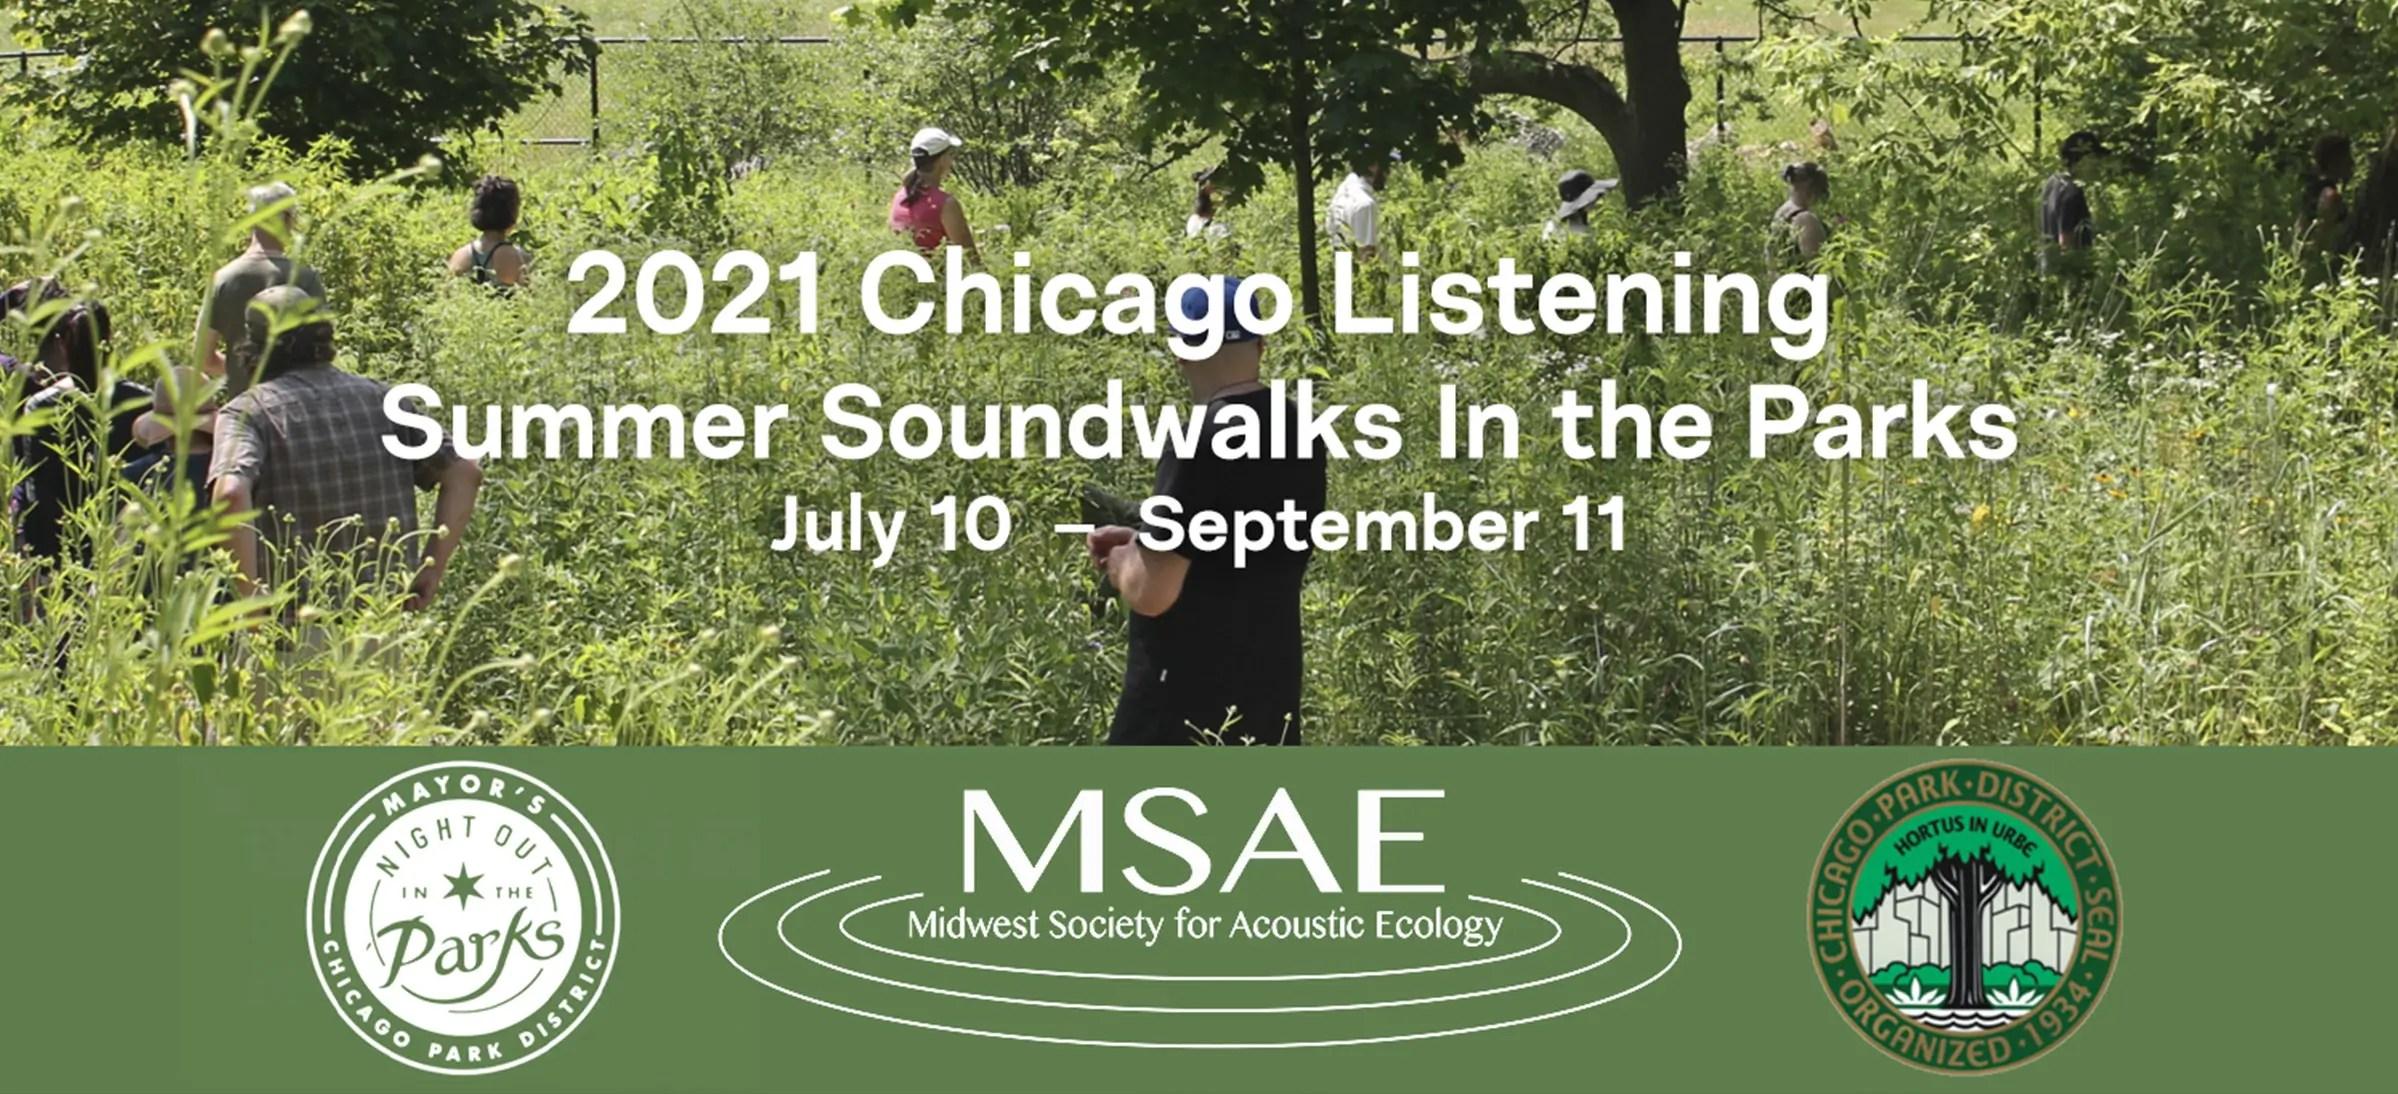 Soundwalks In the Parks 2021